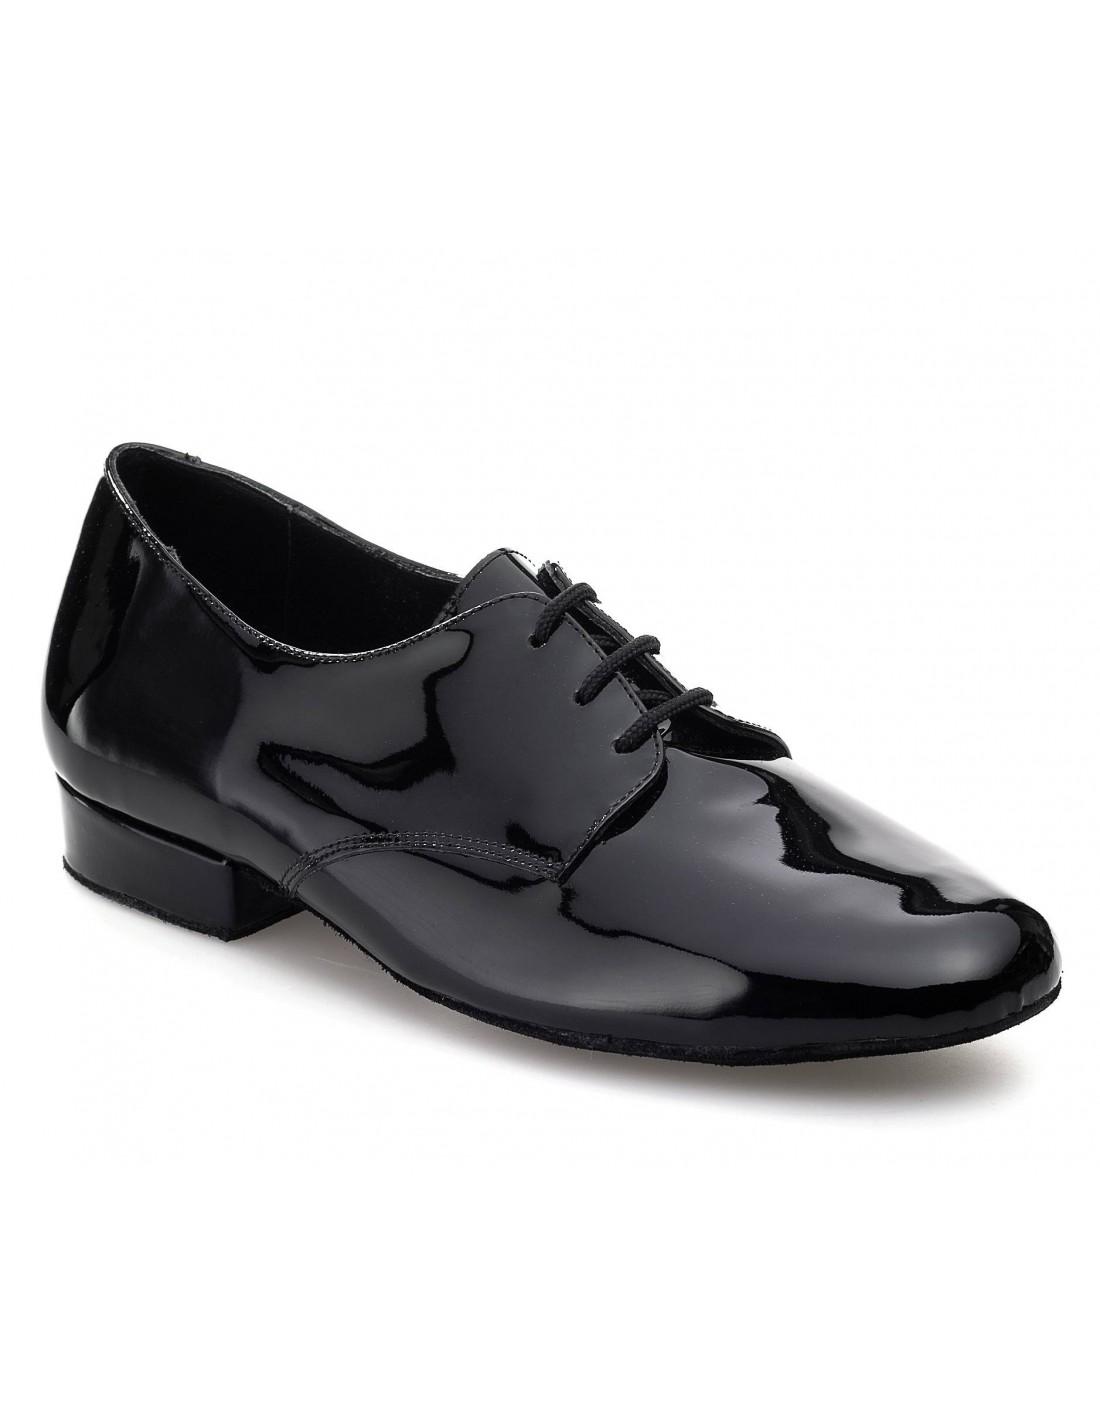 chaussure homme mode en cuir bout pointu. Black Bedroom Furniture Sets. Home Design Ideas